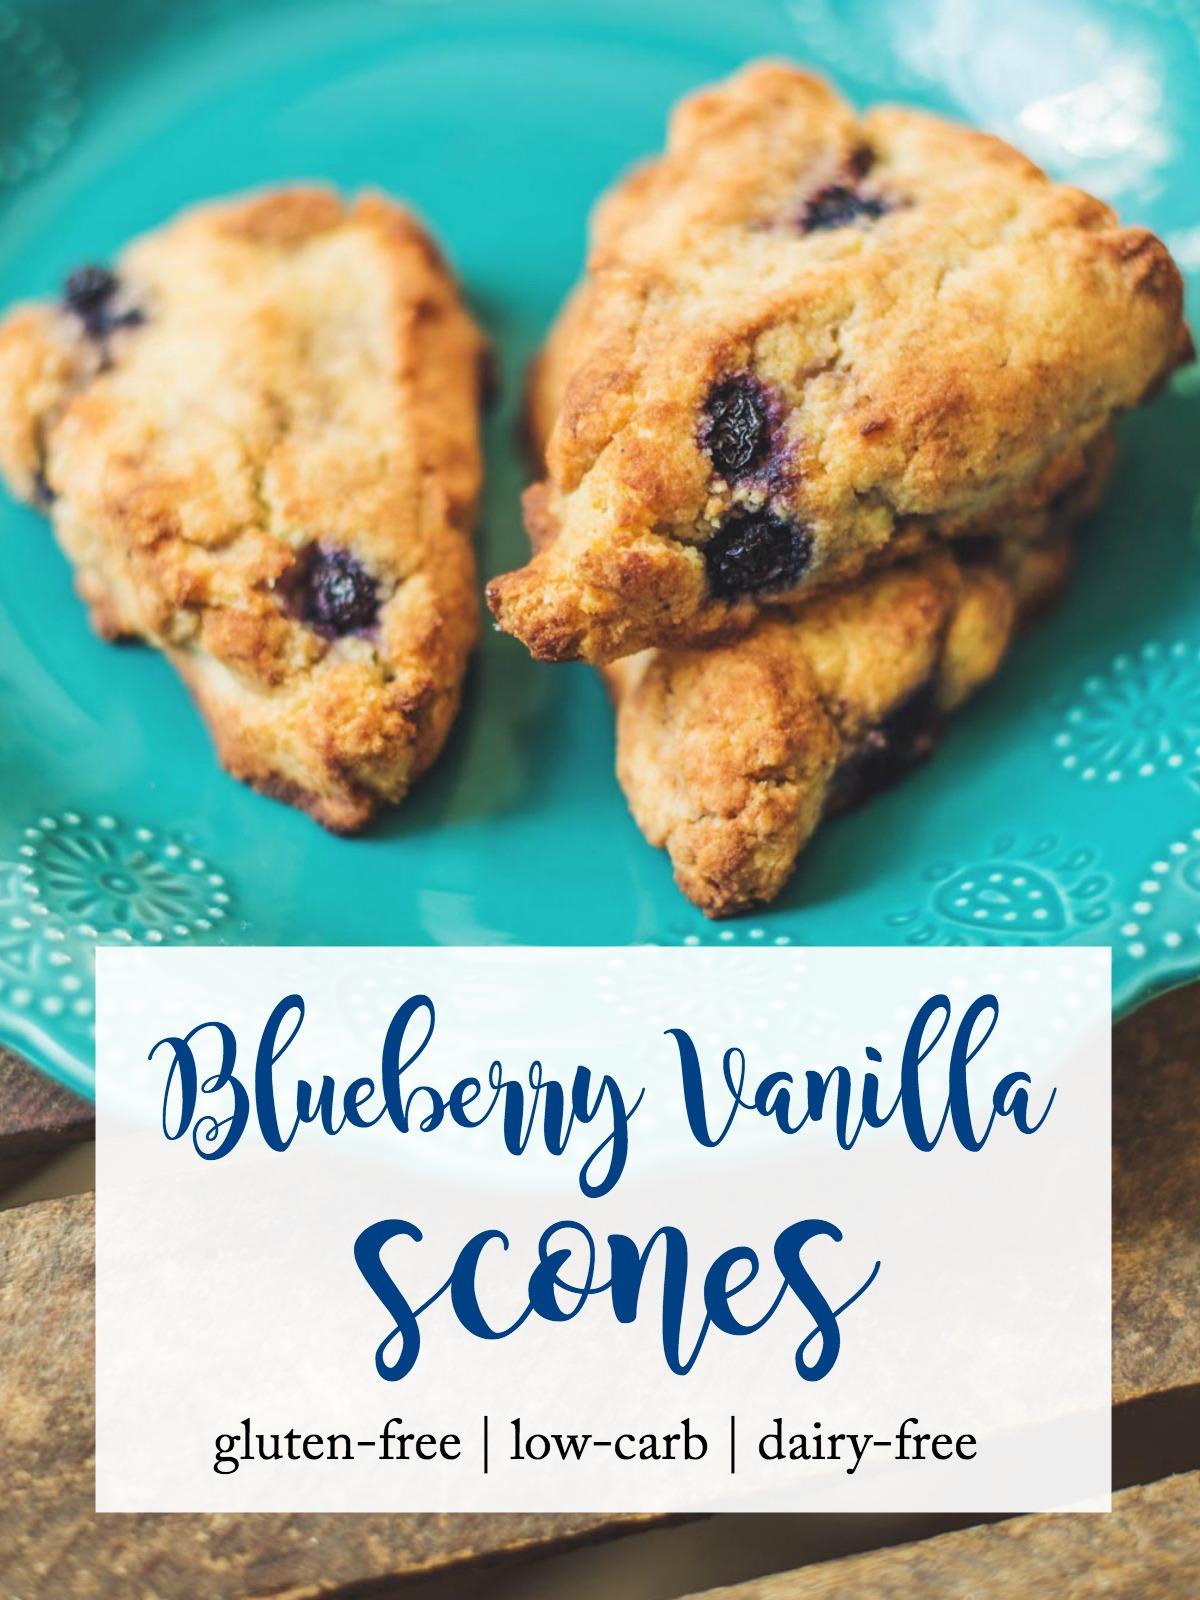 Blueberry Vanilla Scones - Keto, Dairy-free, Gluten-free, THM-S